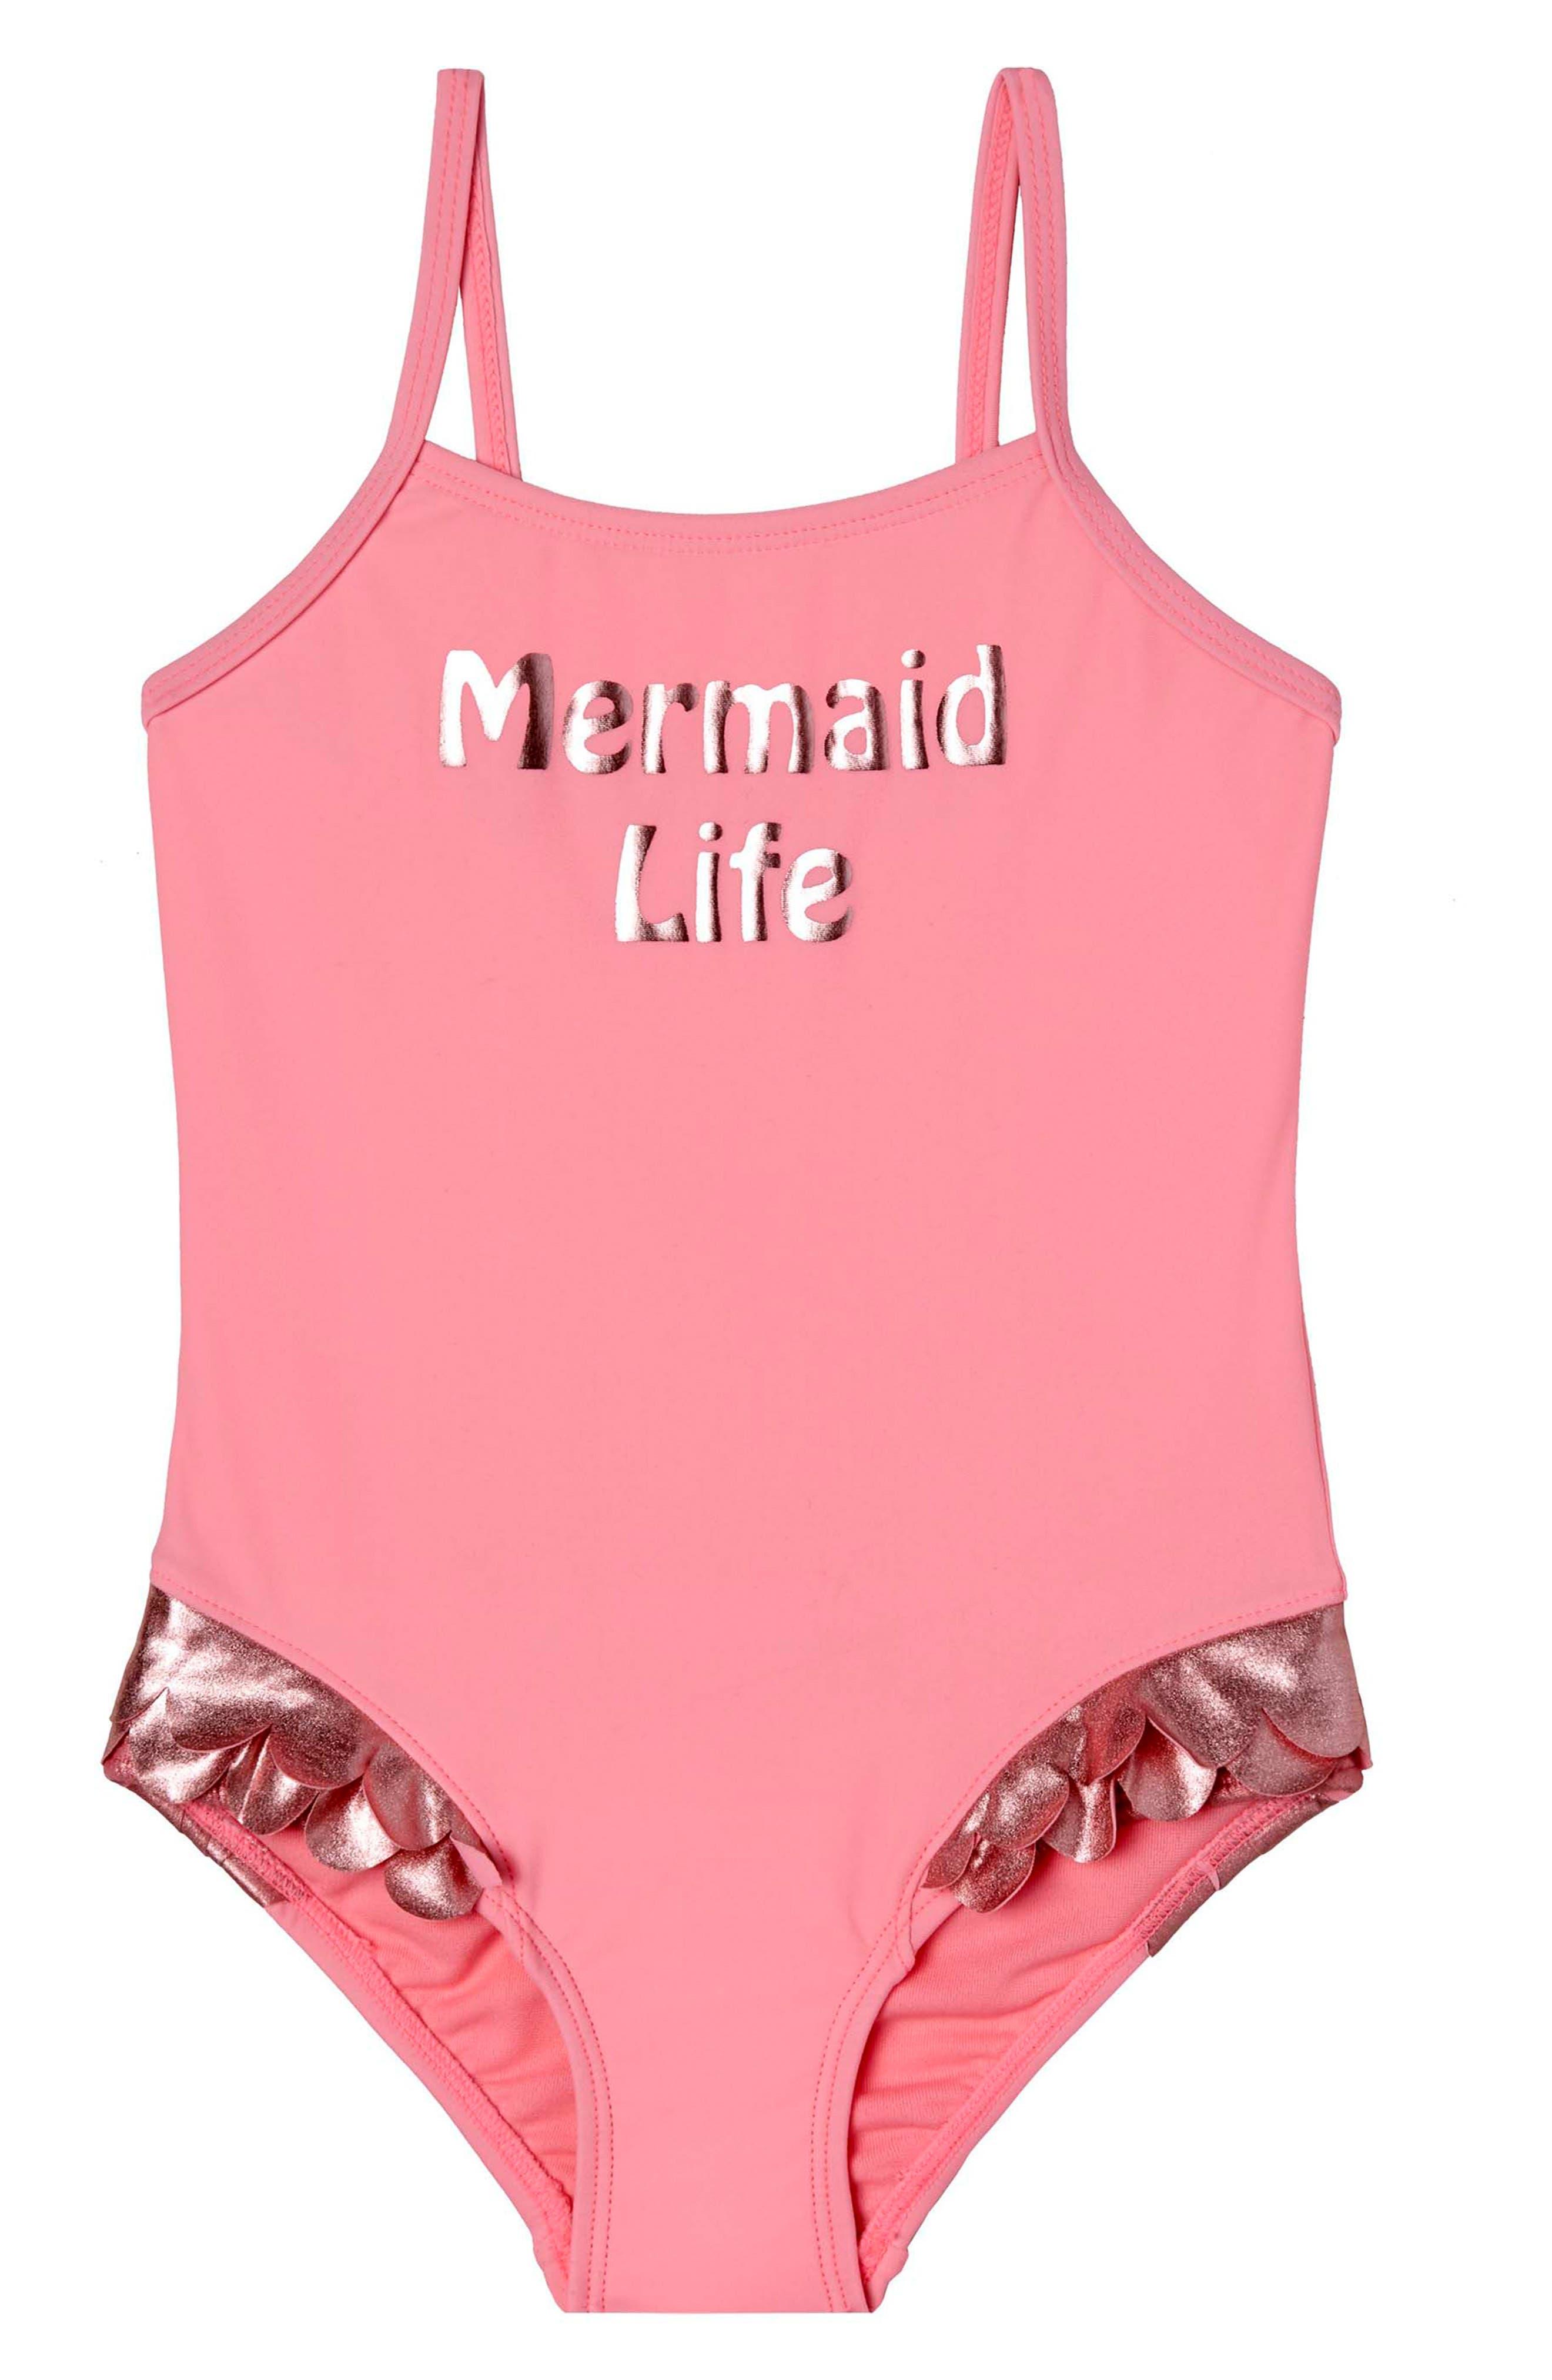 Main Image - Hula Star Mermaid Life One-Piece Swimsuit (Toddler Girls & Little Girls)